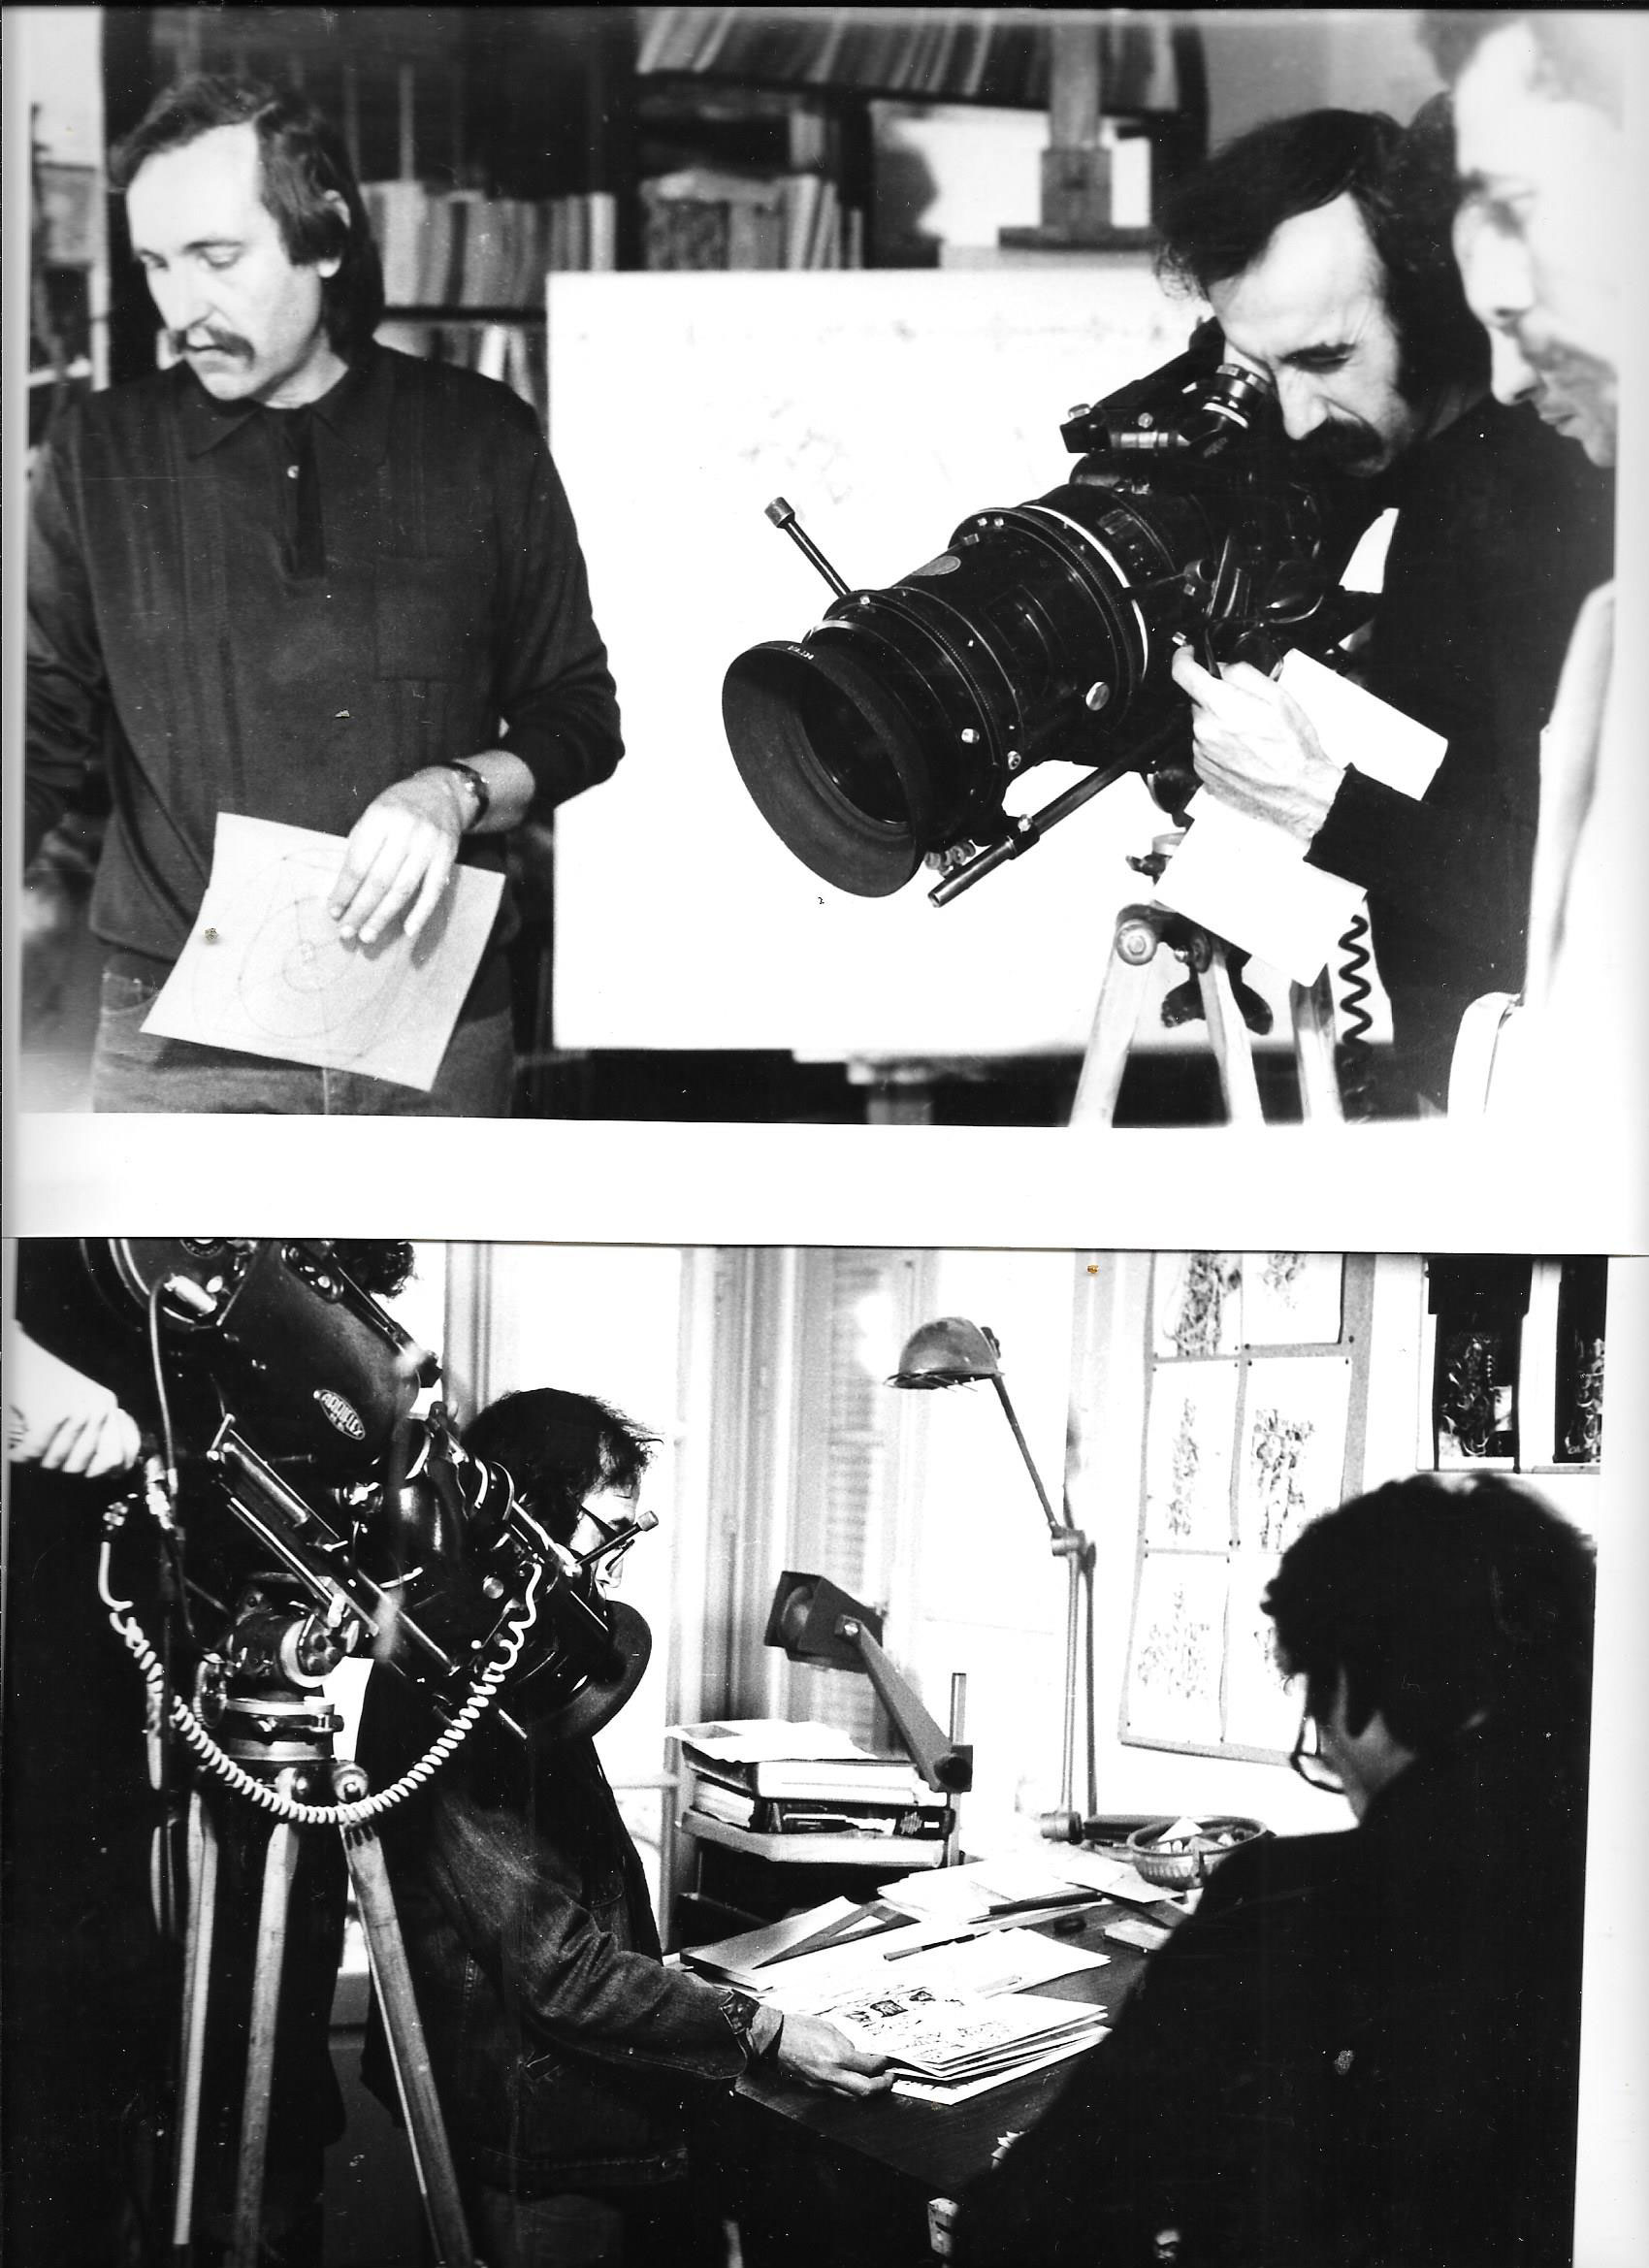 Denis-Martinez-et-JP-Lledo---Tournage-2-films-l'Oeuvre-et-le-Peintre.-1984,-Blida,-